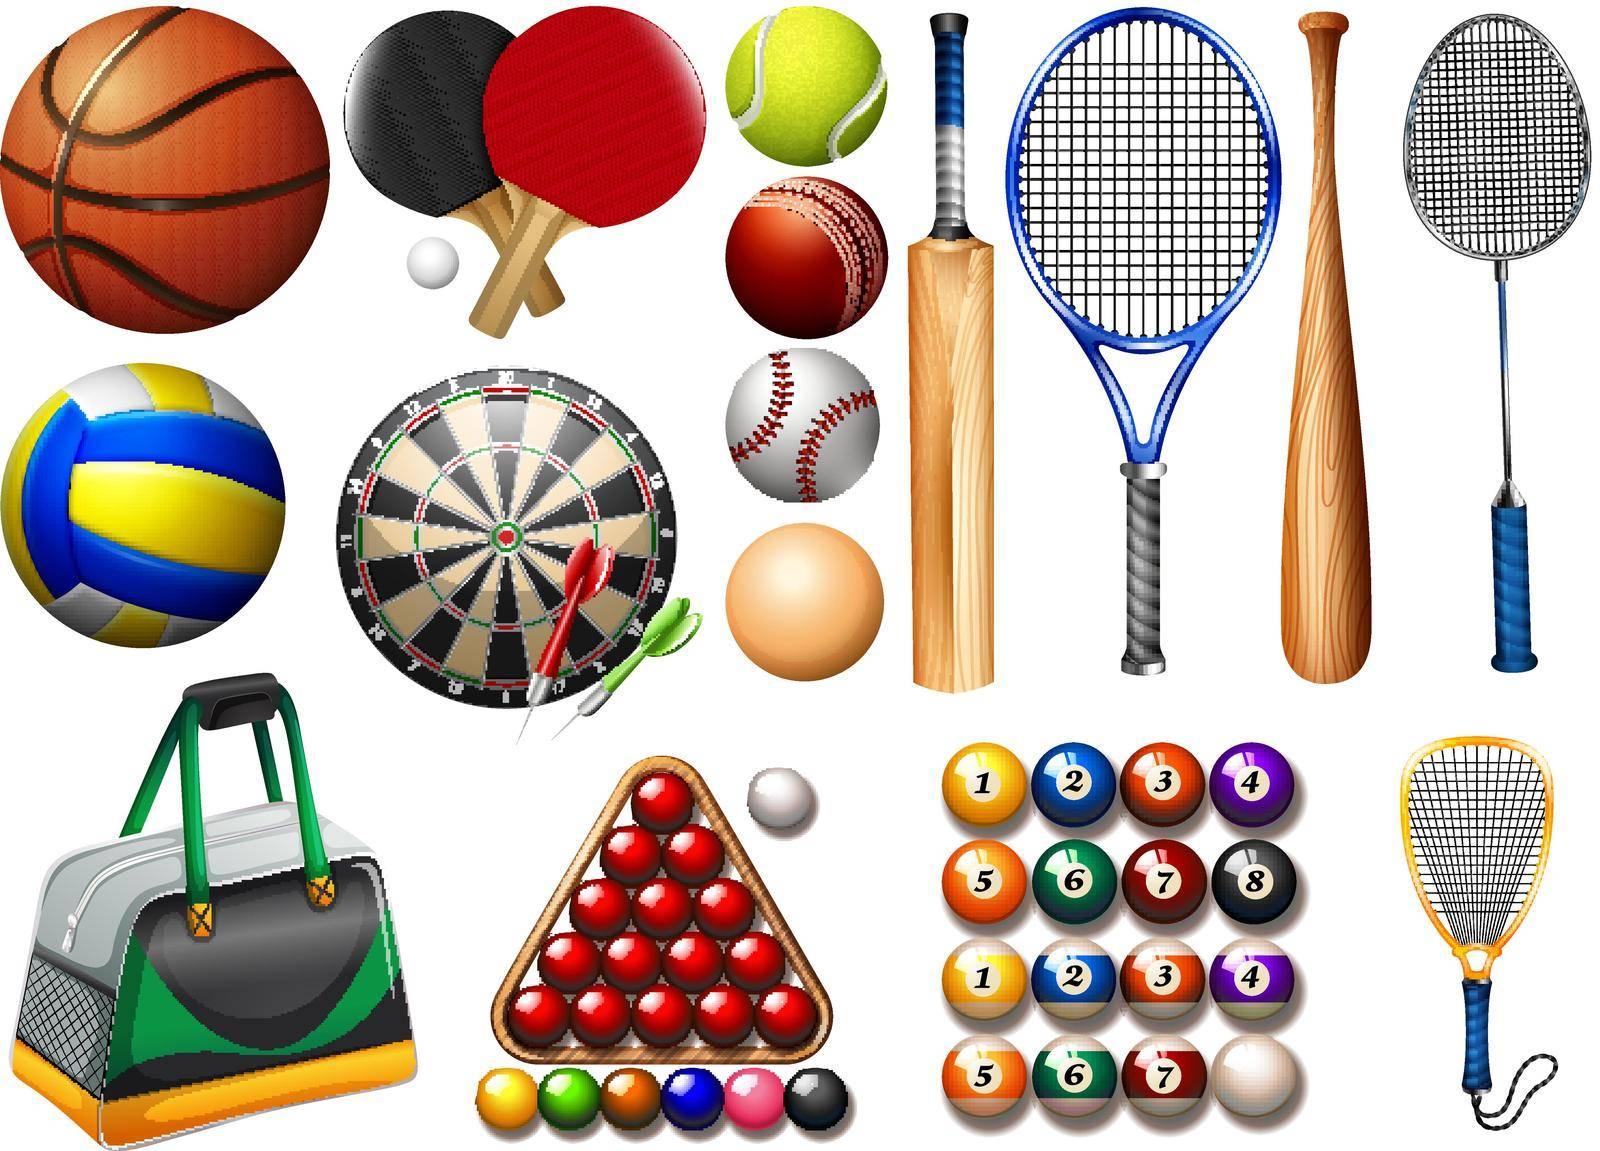 Sports equipment and balls illustration